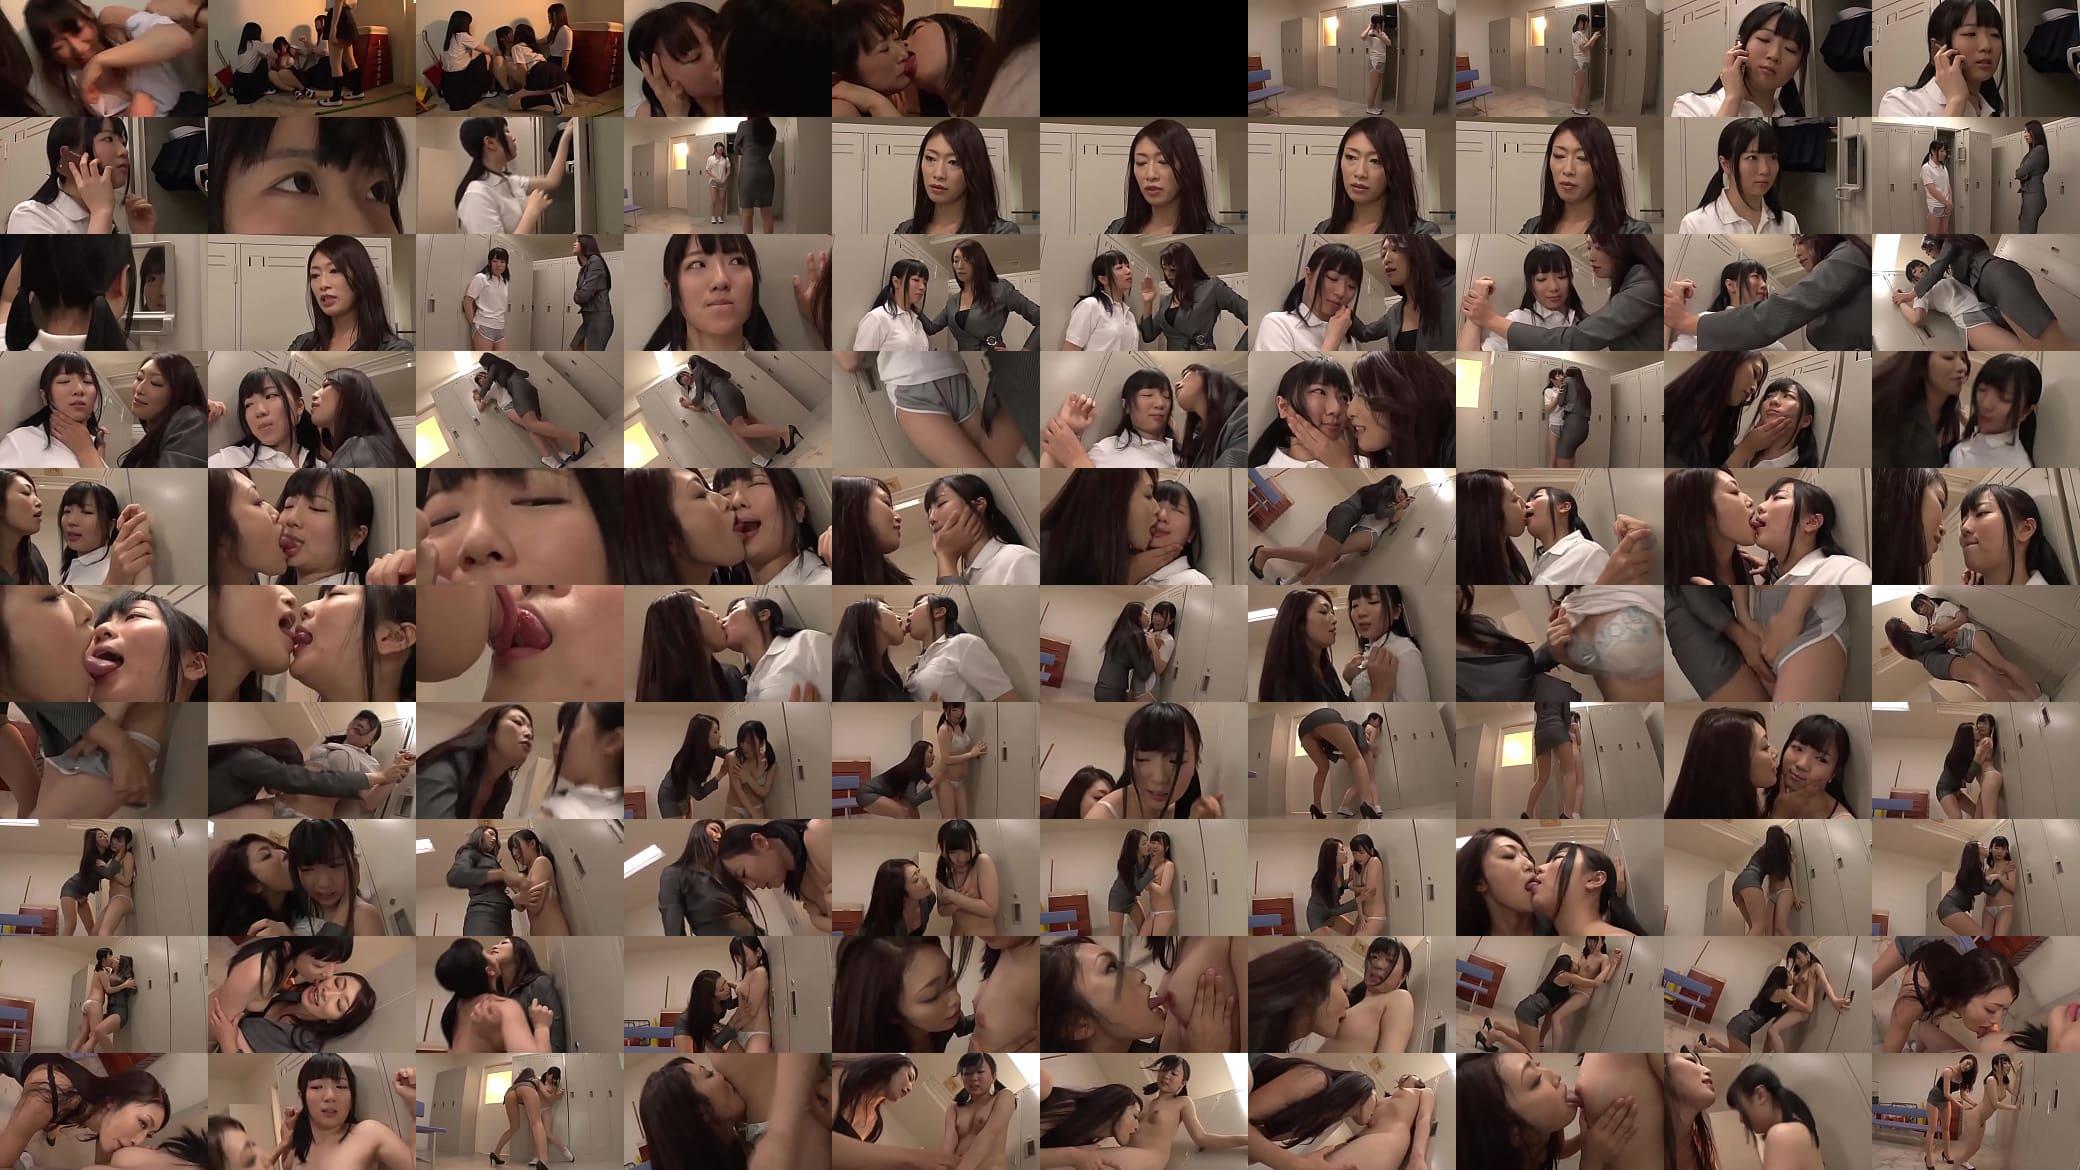 Porno clips of women